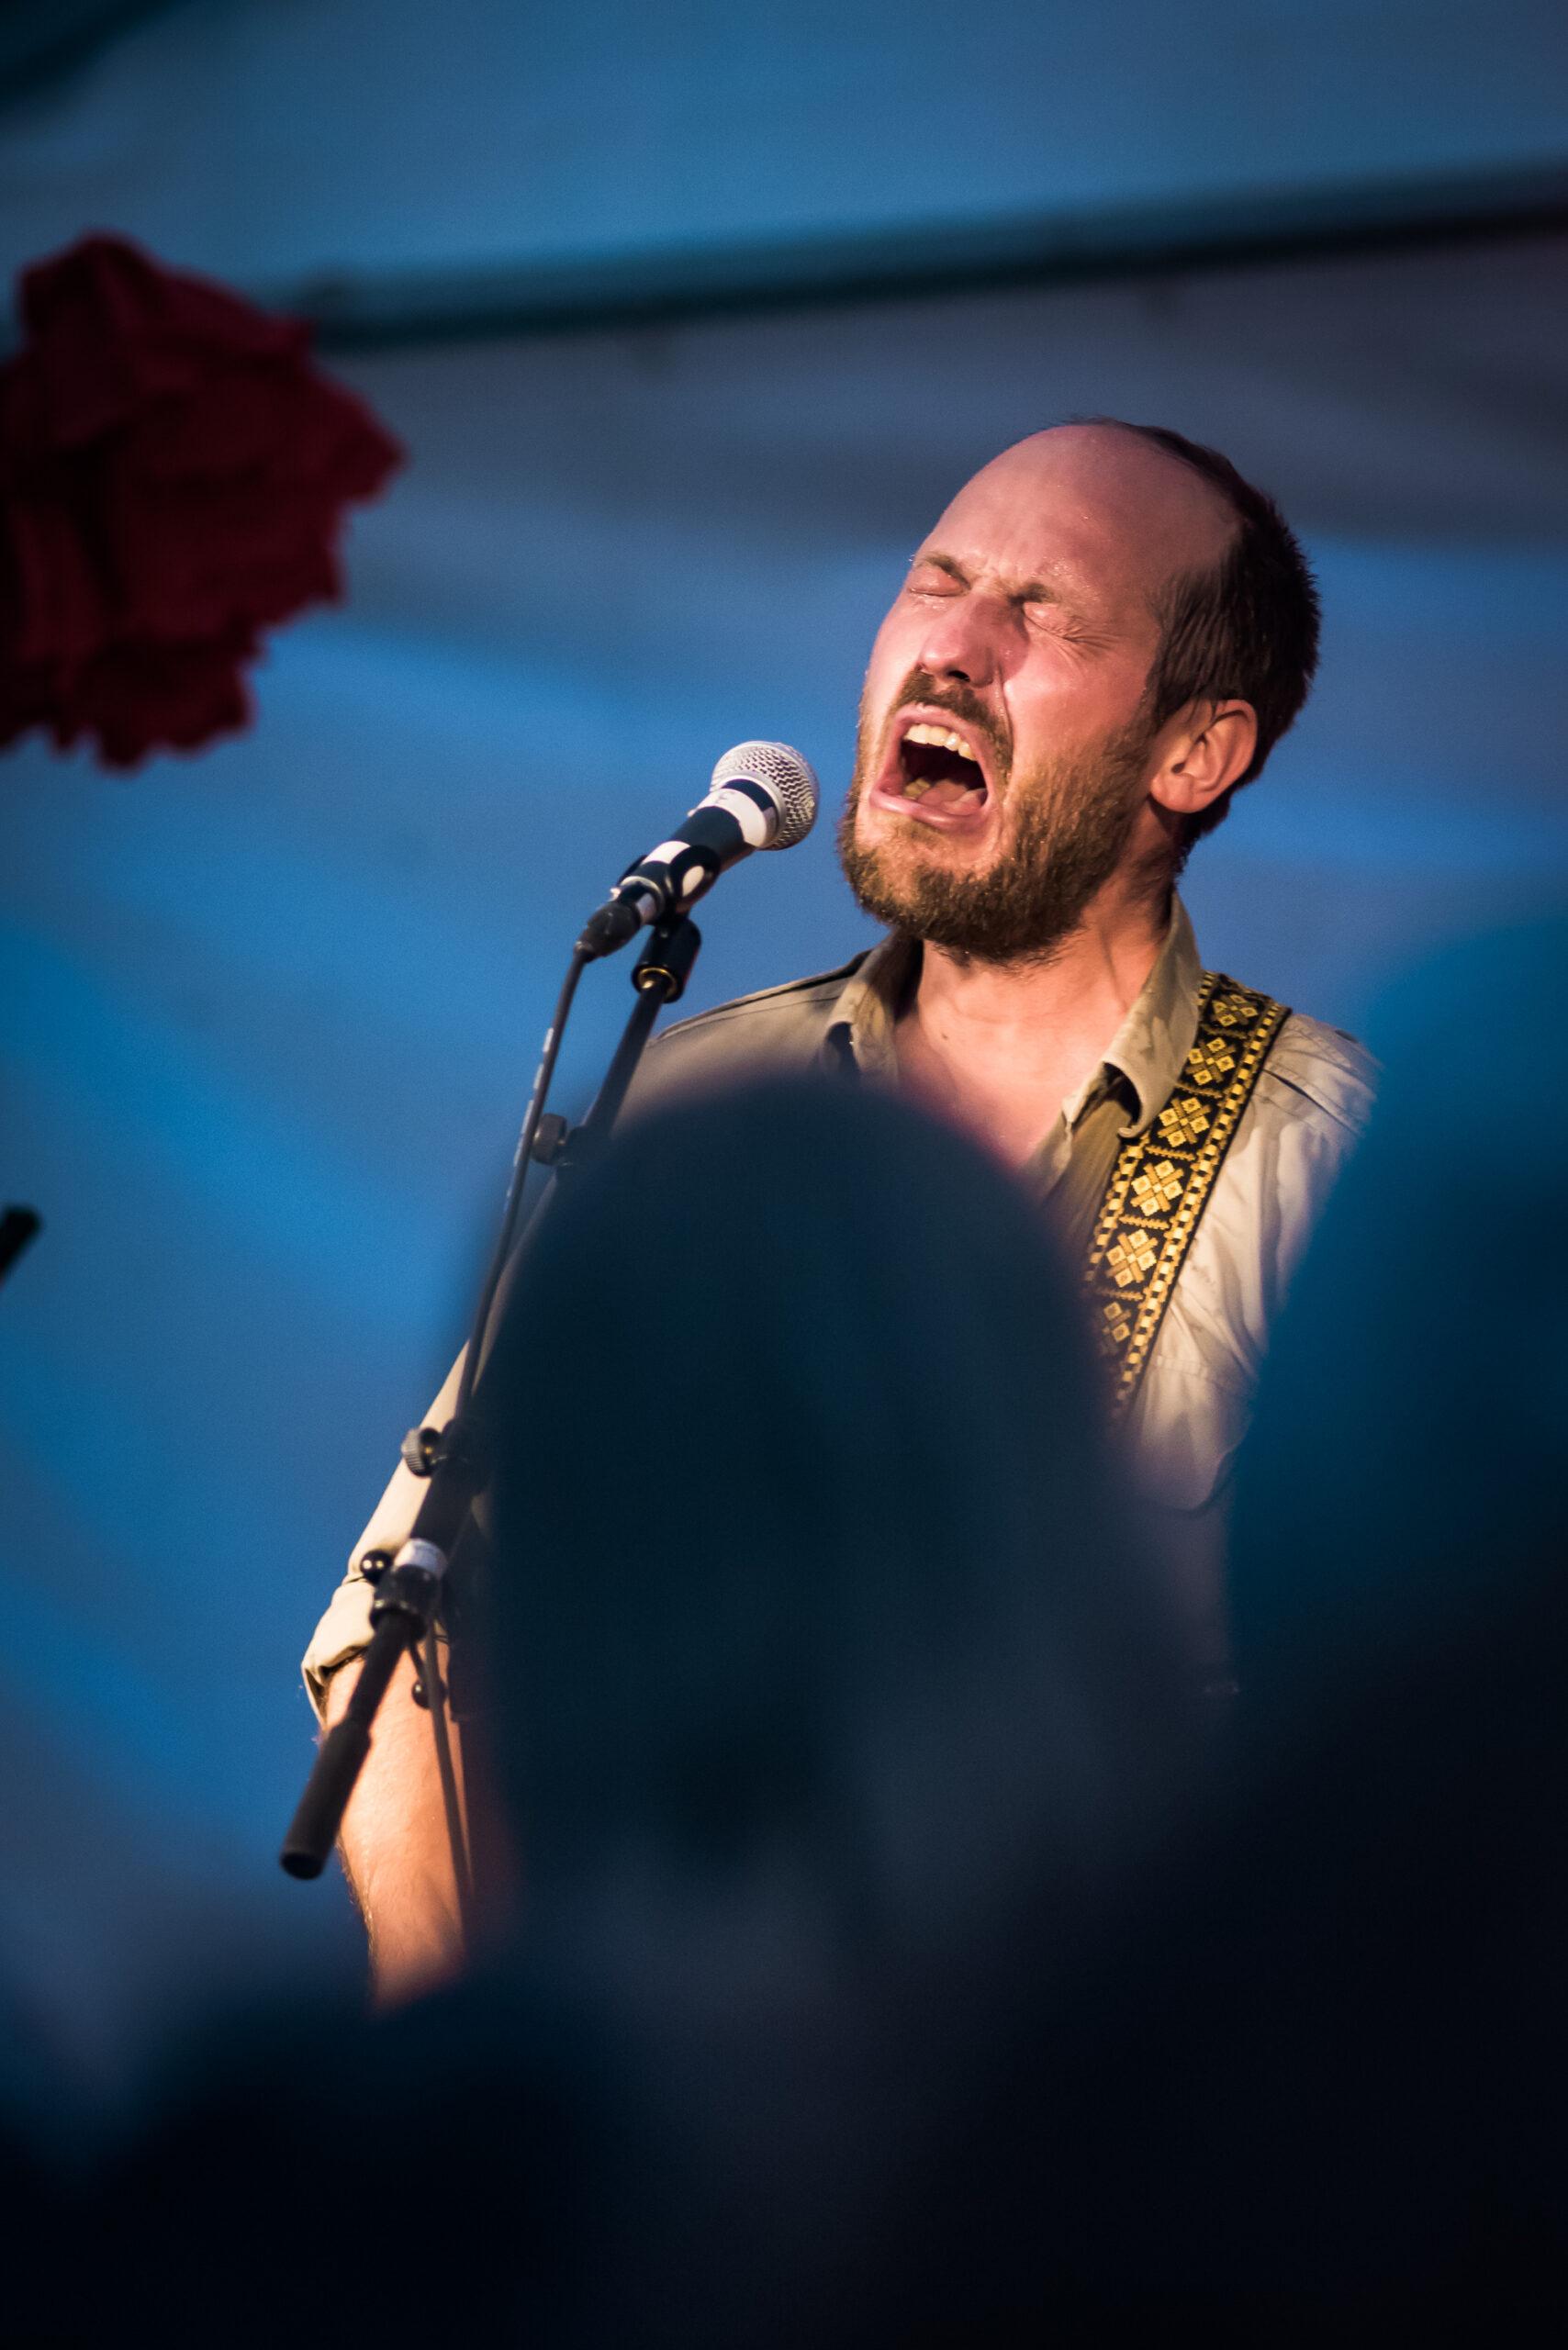 Johan Airijoki, Musikens makt, Luleå 2017.